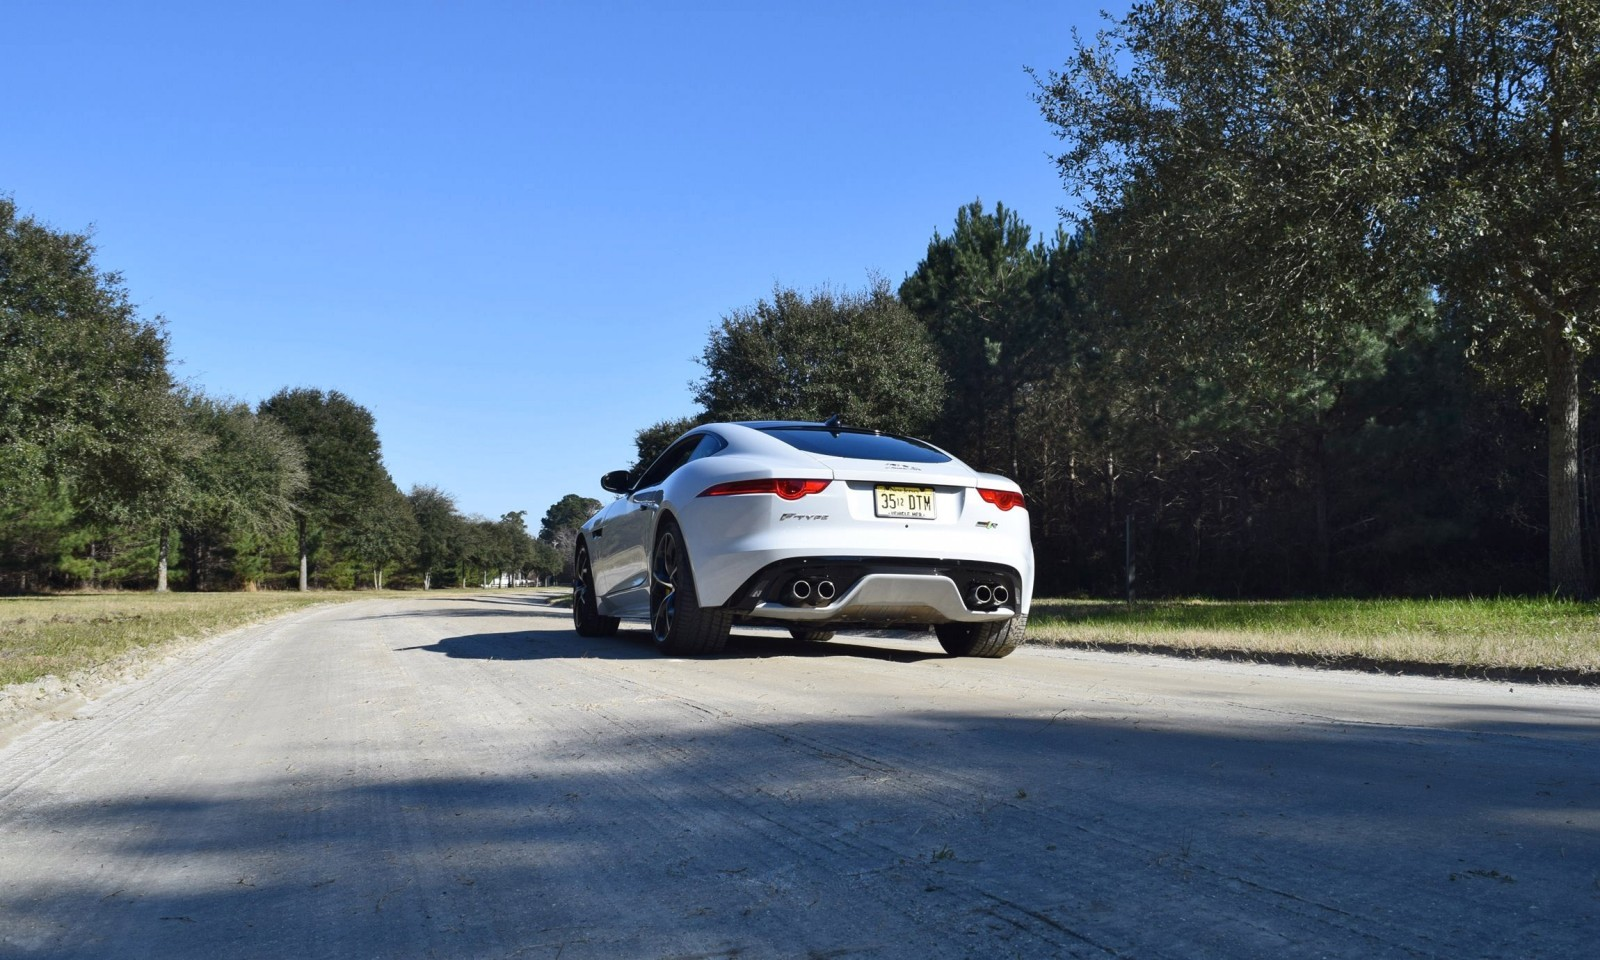 2016 aston martin v8 vantage gts review